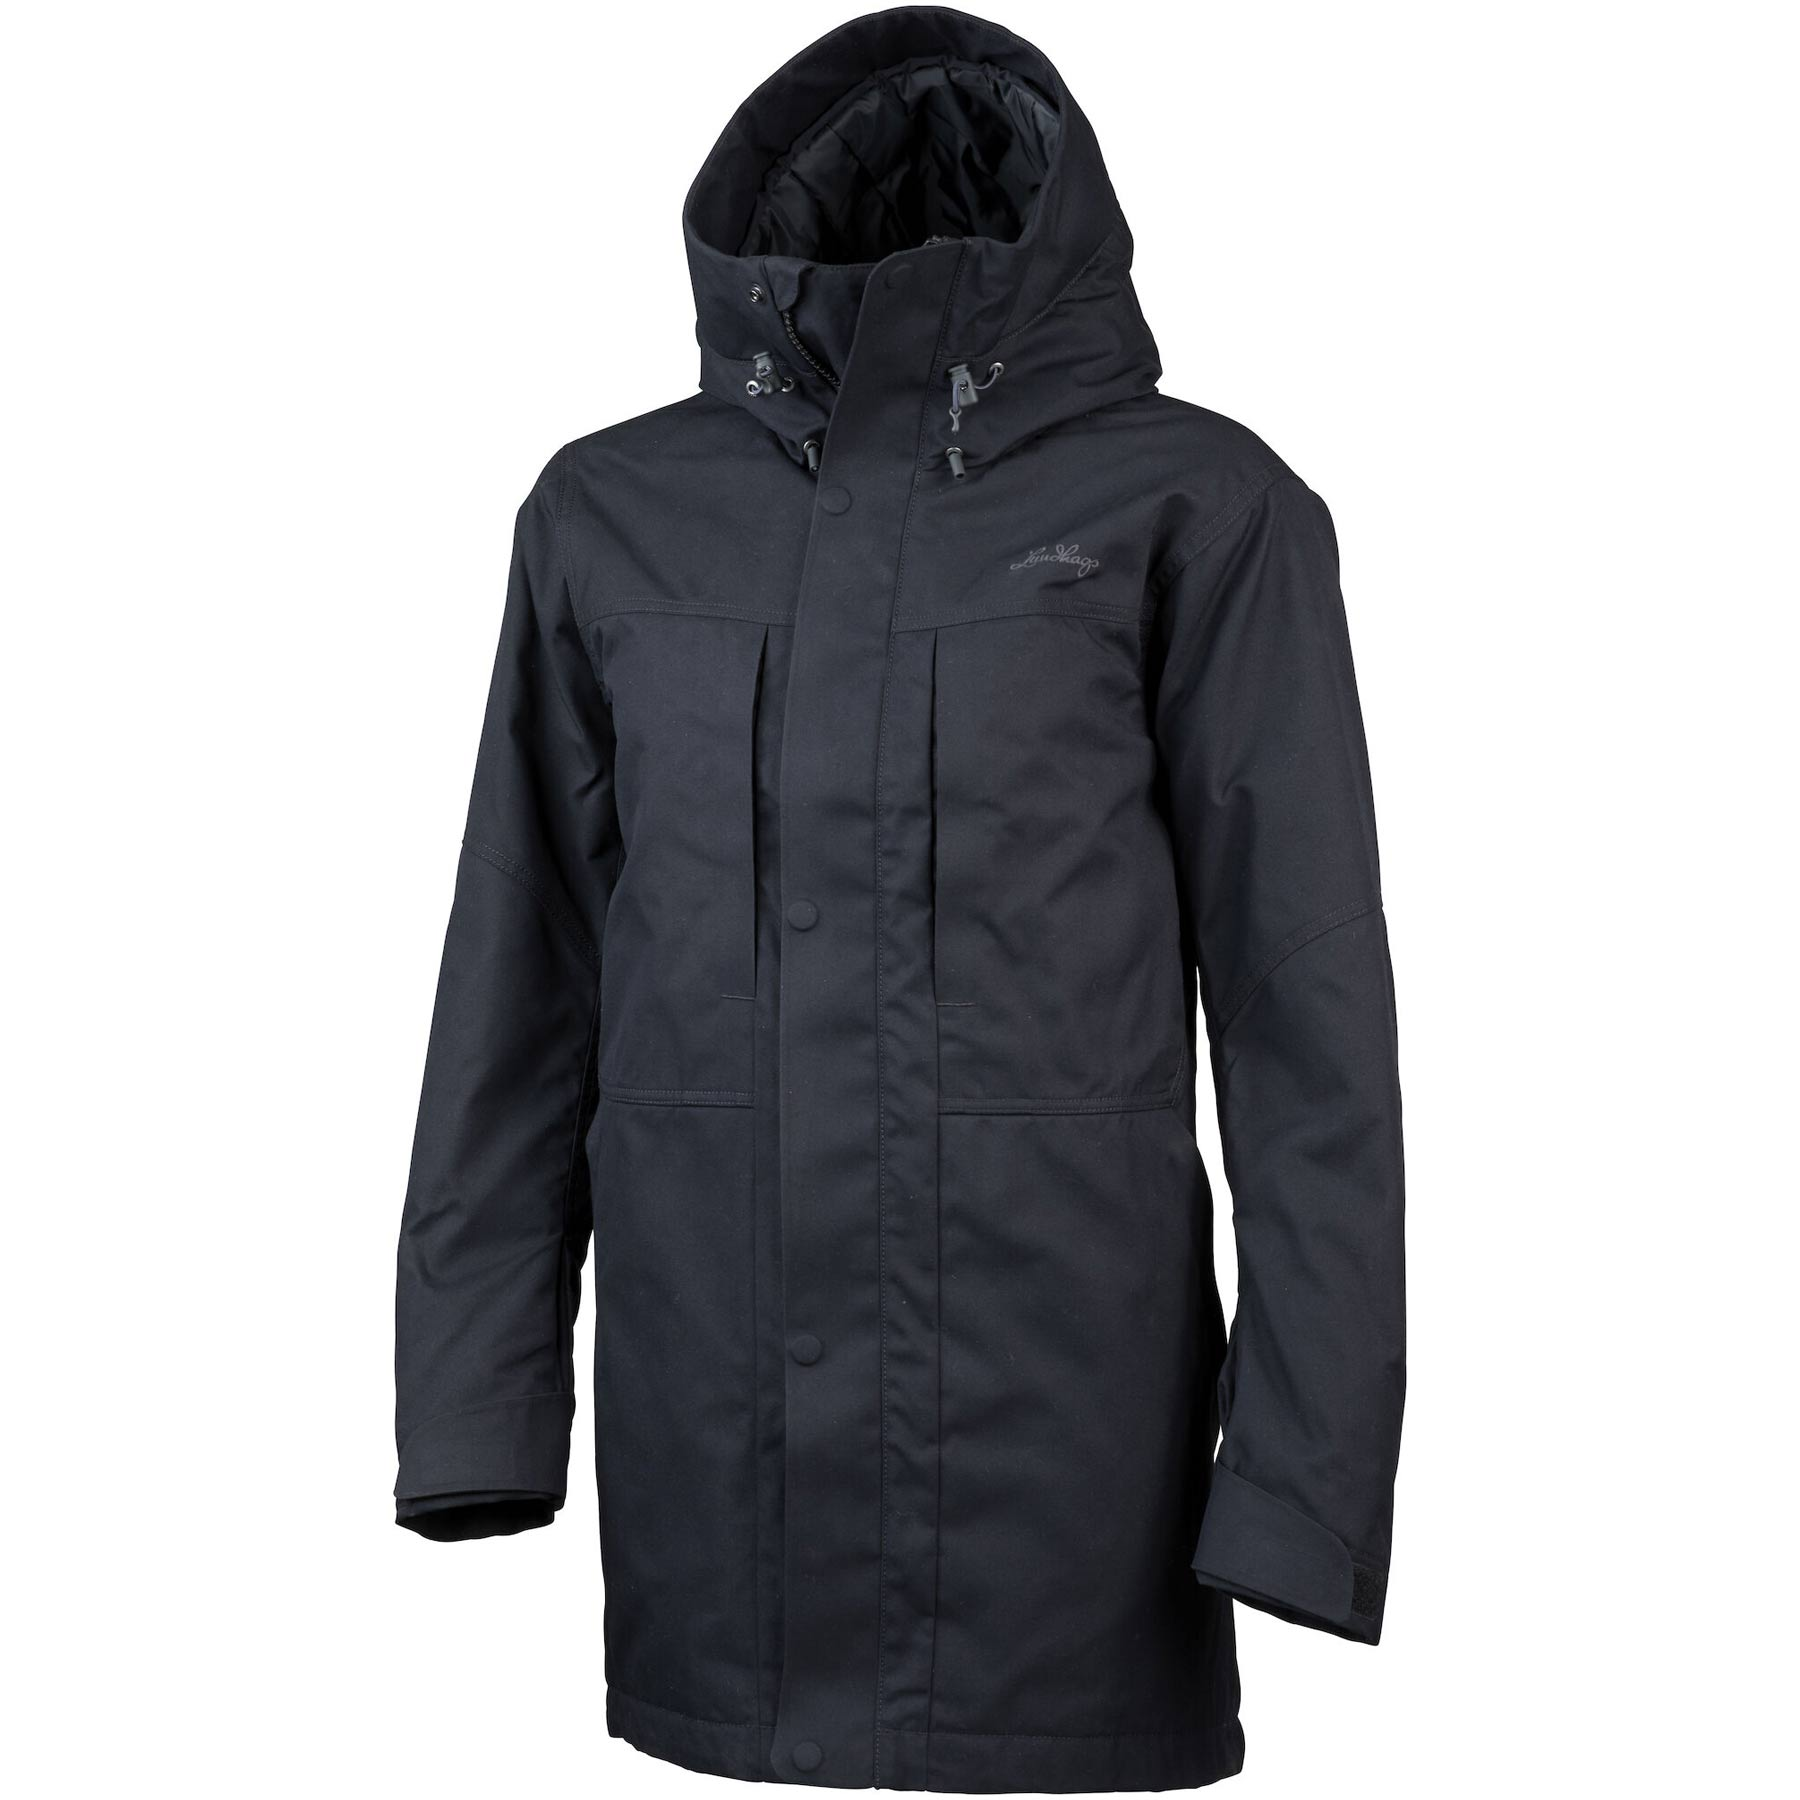 Lundhags Sprek Insulated Women's Jacket - Black 900